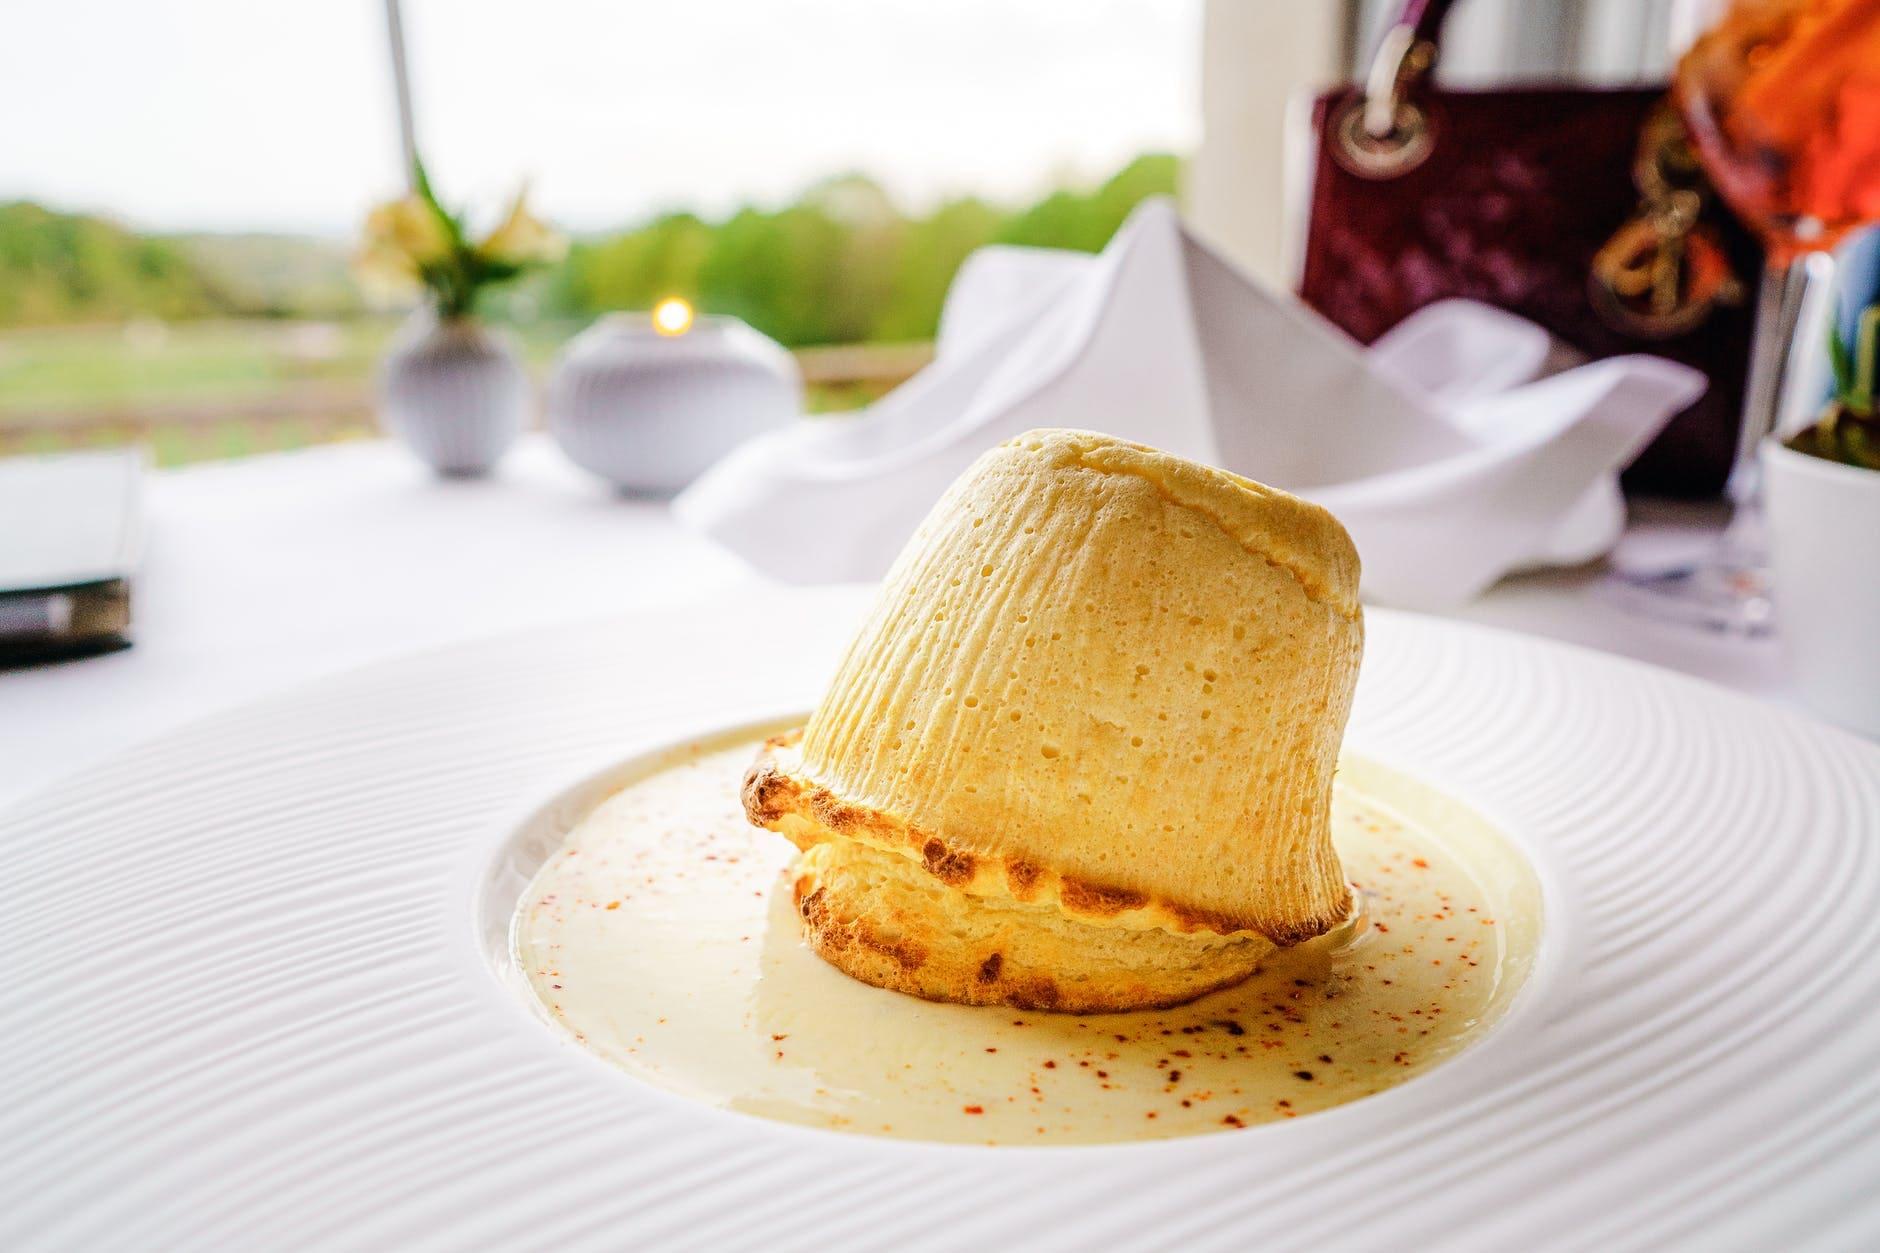 How to make a fragile vanilla cake